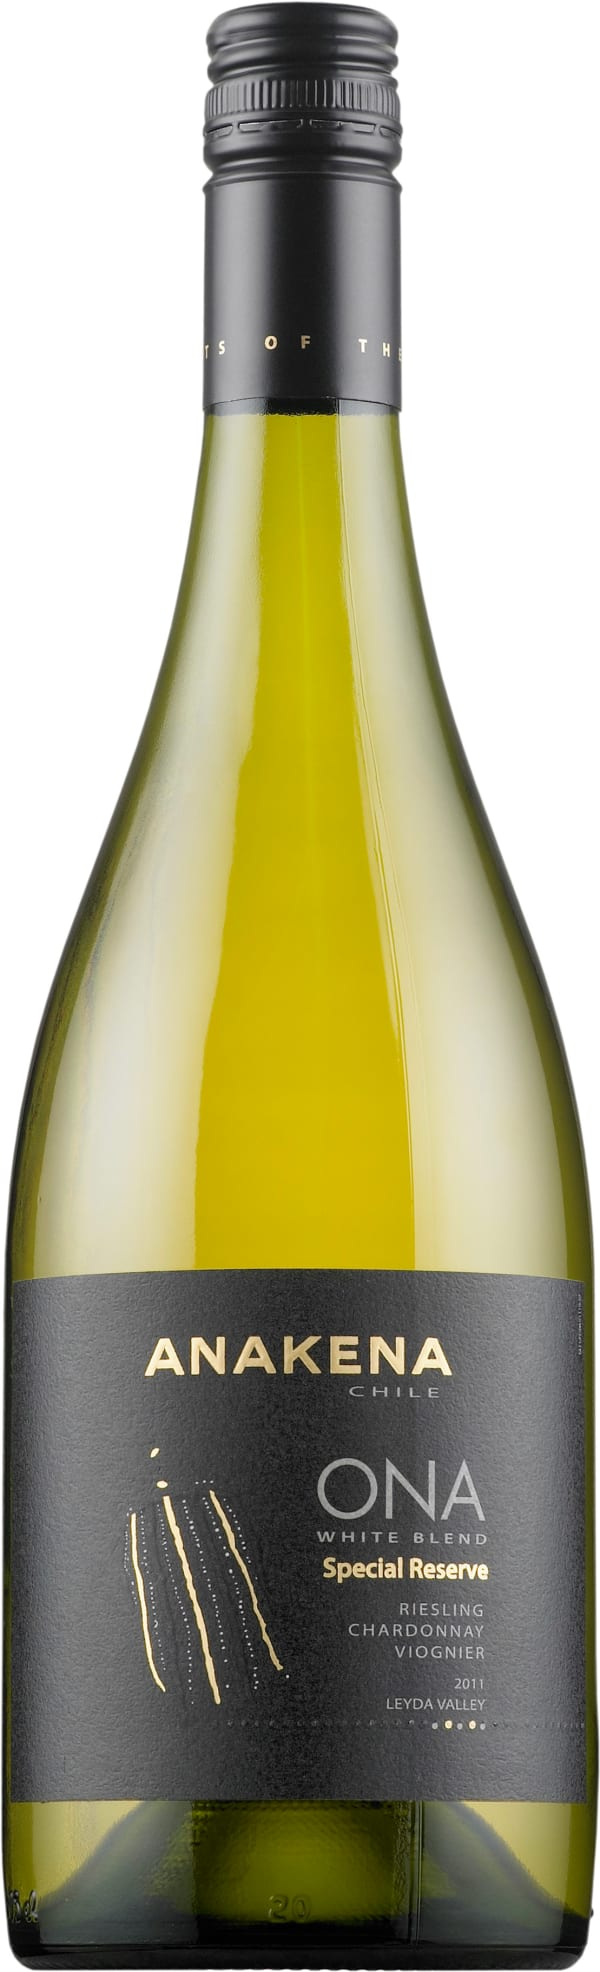 Anakena Ona Special Reserve Riesling Chardonnay Viognier 2014